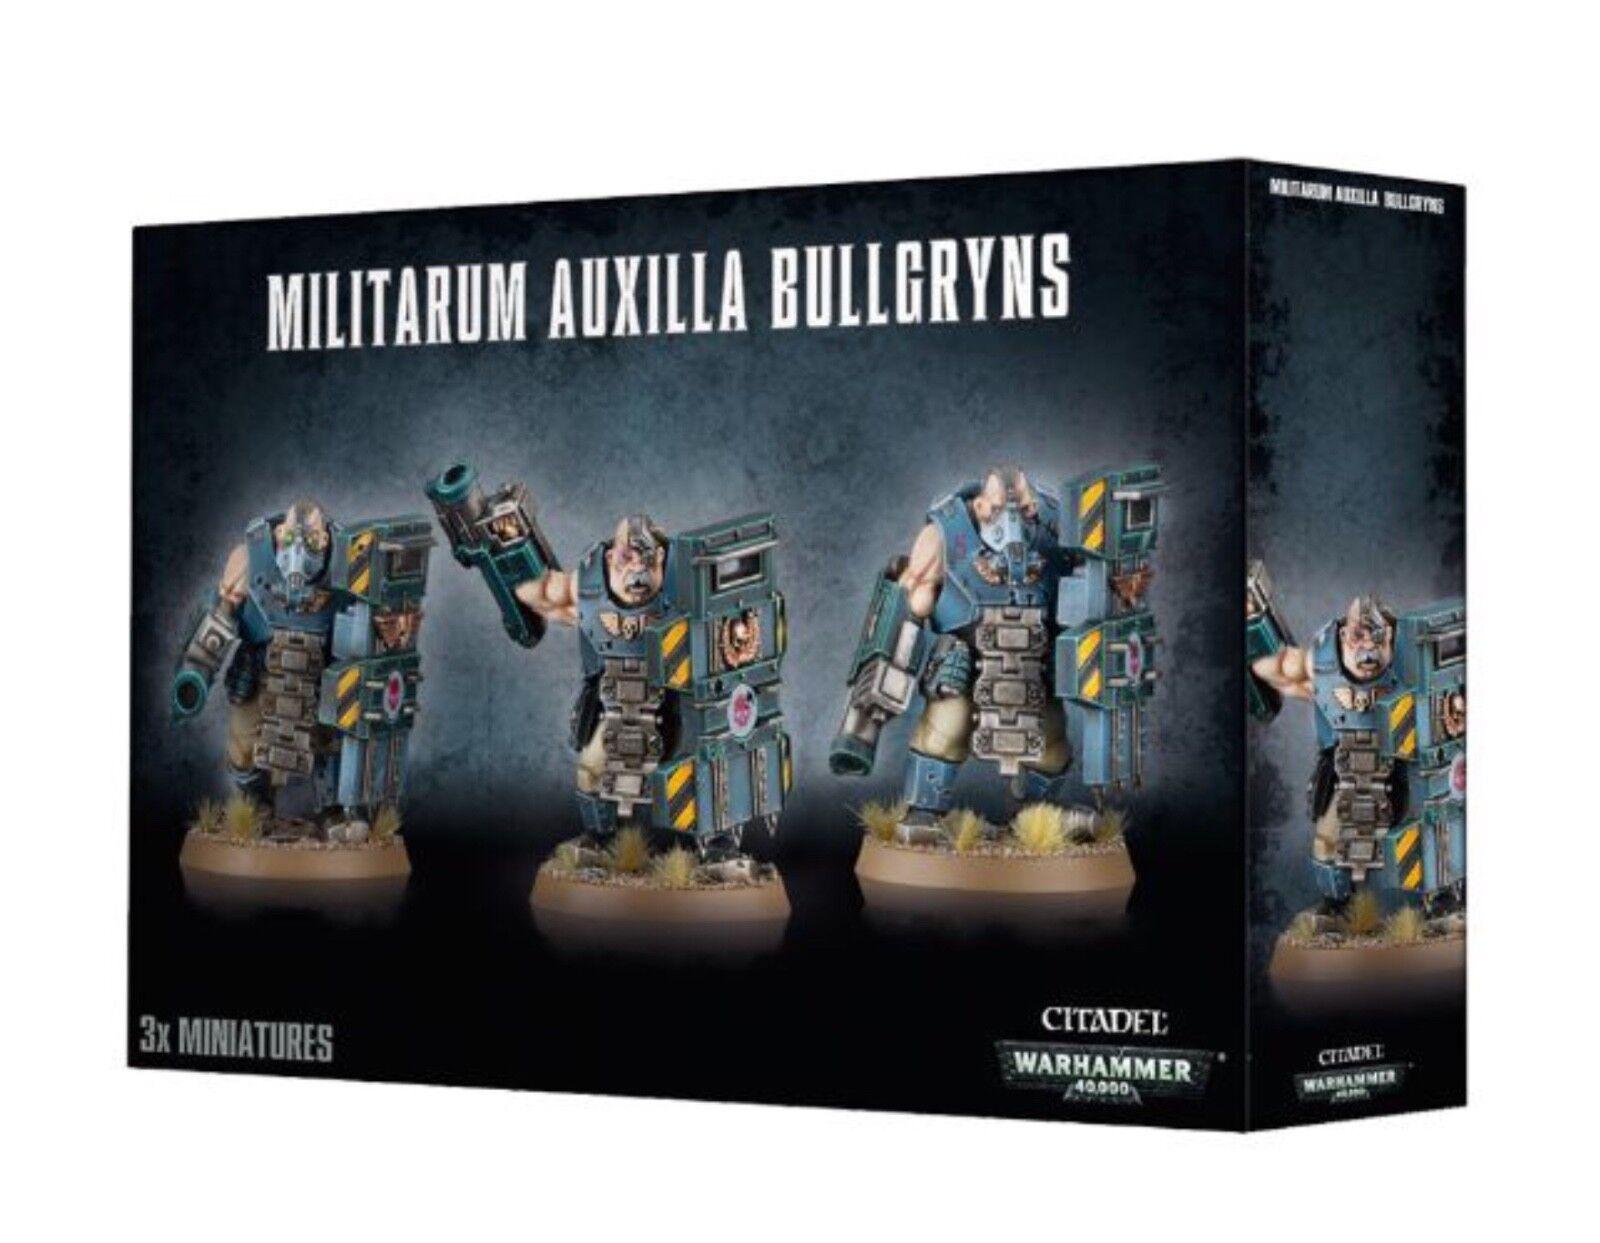 Warhammer 40k Astra Militarum  bullgryns Nuevo en Caja (47-14)